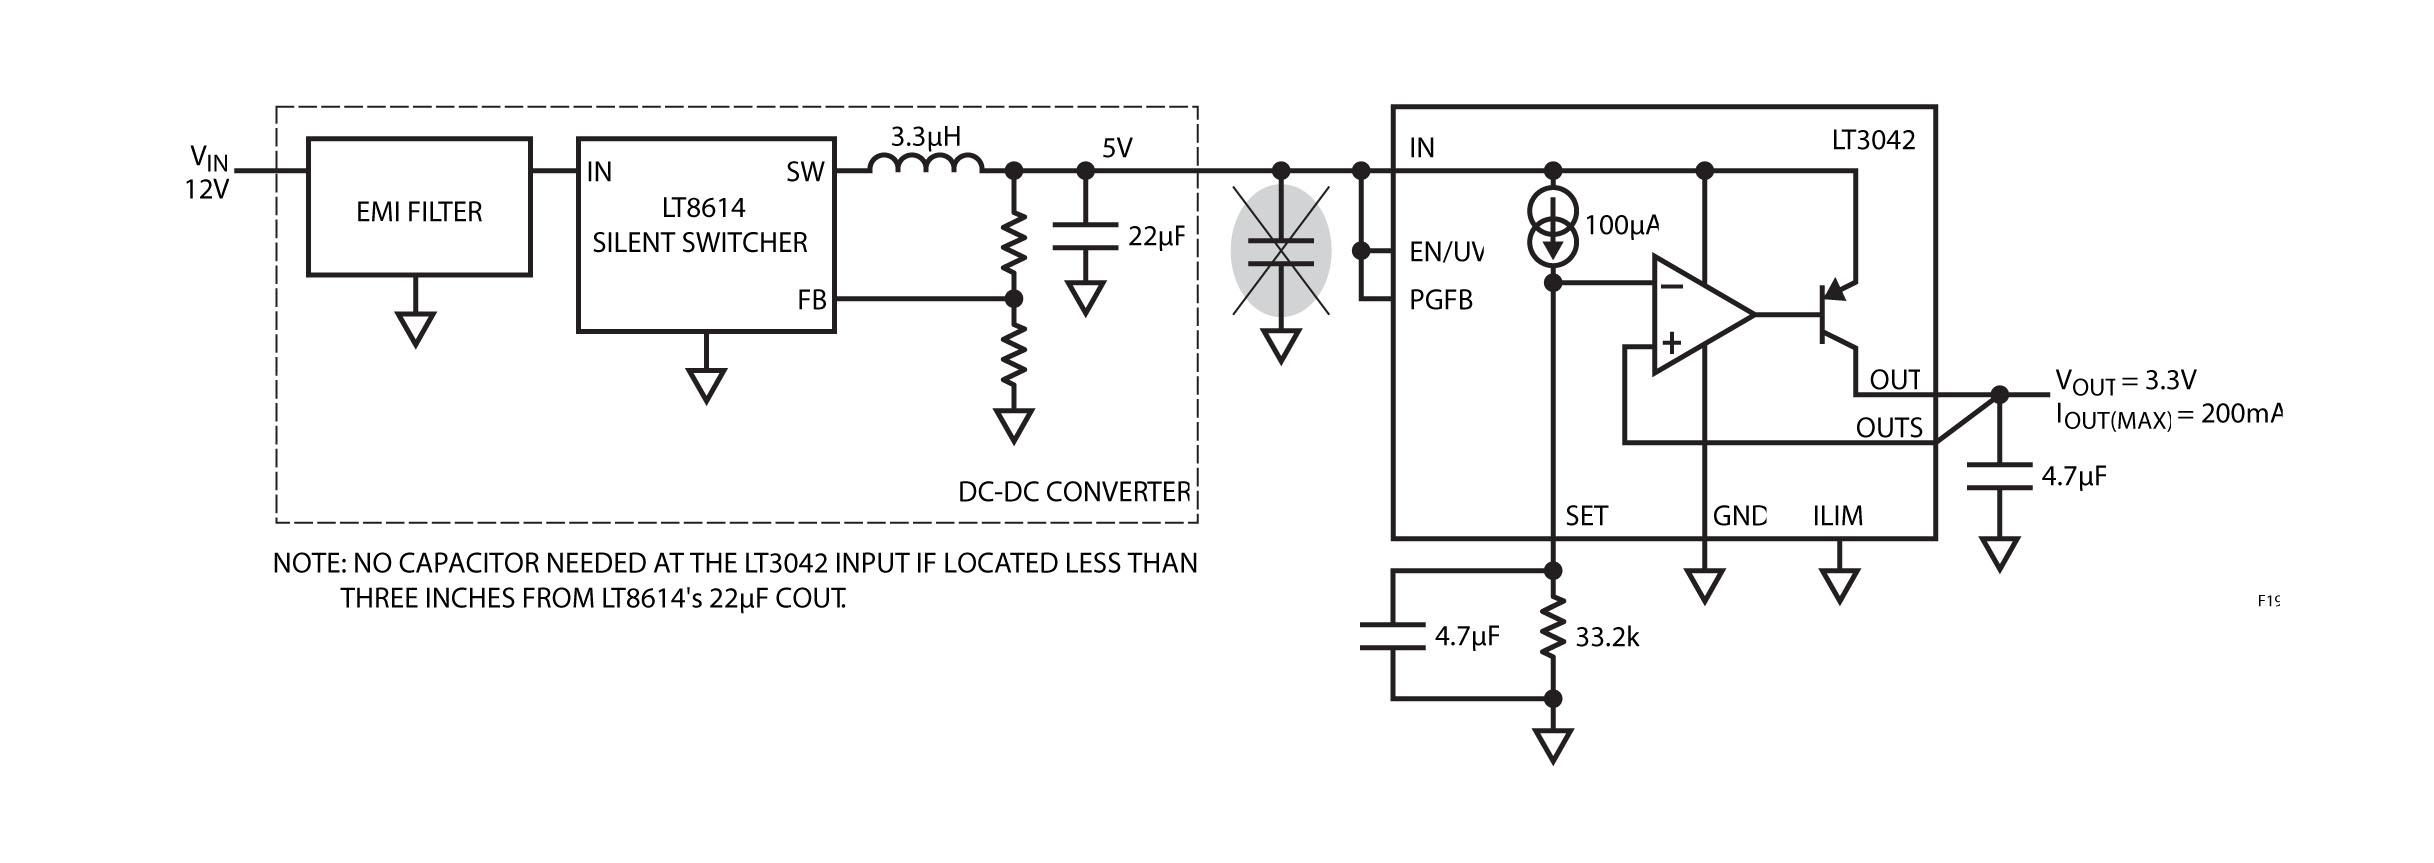 Figura 19. Uso dell'LT3042 per post-regolare l'LT8614 Silent Switcher.